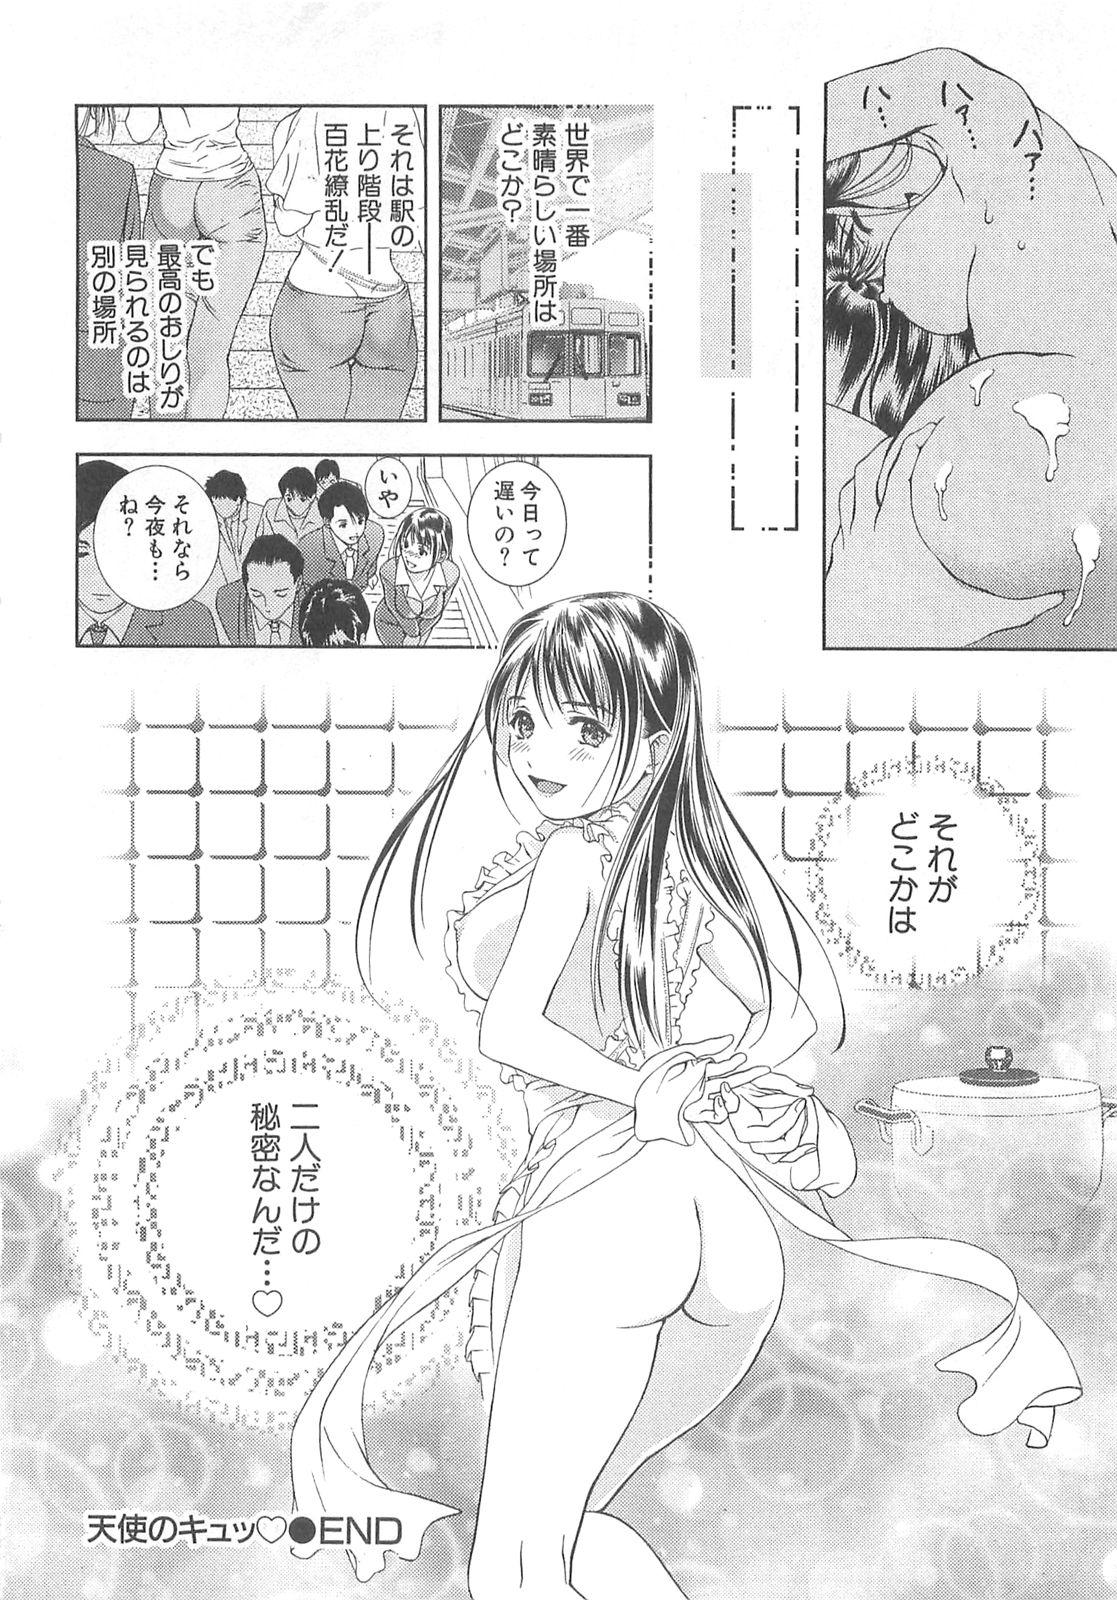 Tenshi no Kyuu - Angel's Pretty Hip 66